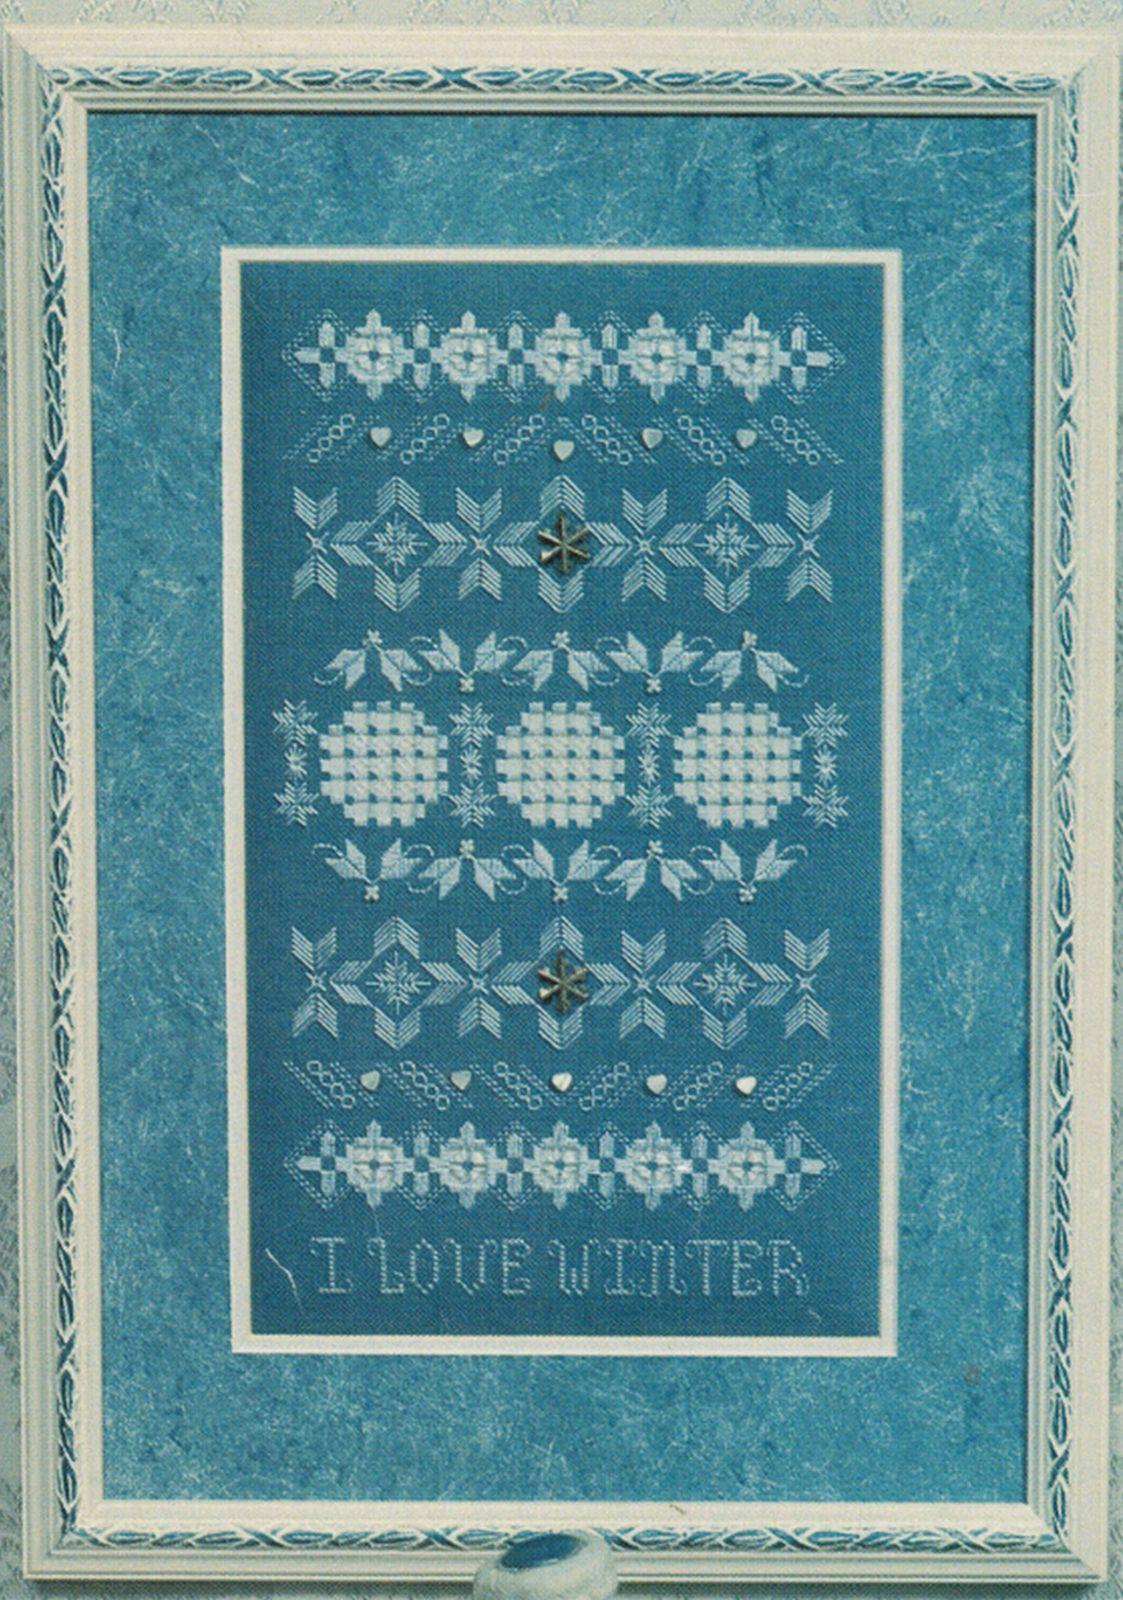 I Love Winter Hardanger Embroidery Seasonal Sampler Rosalyn Watnemo Book image 3